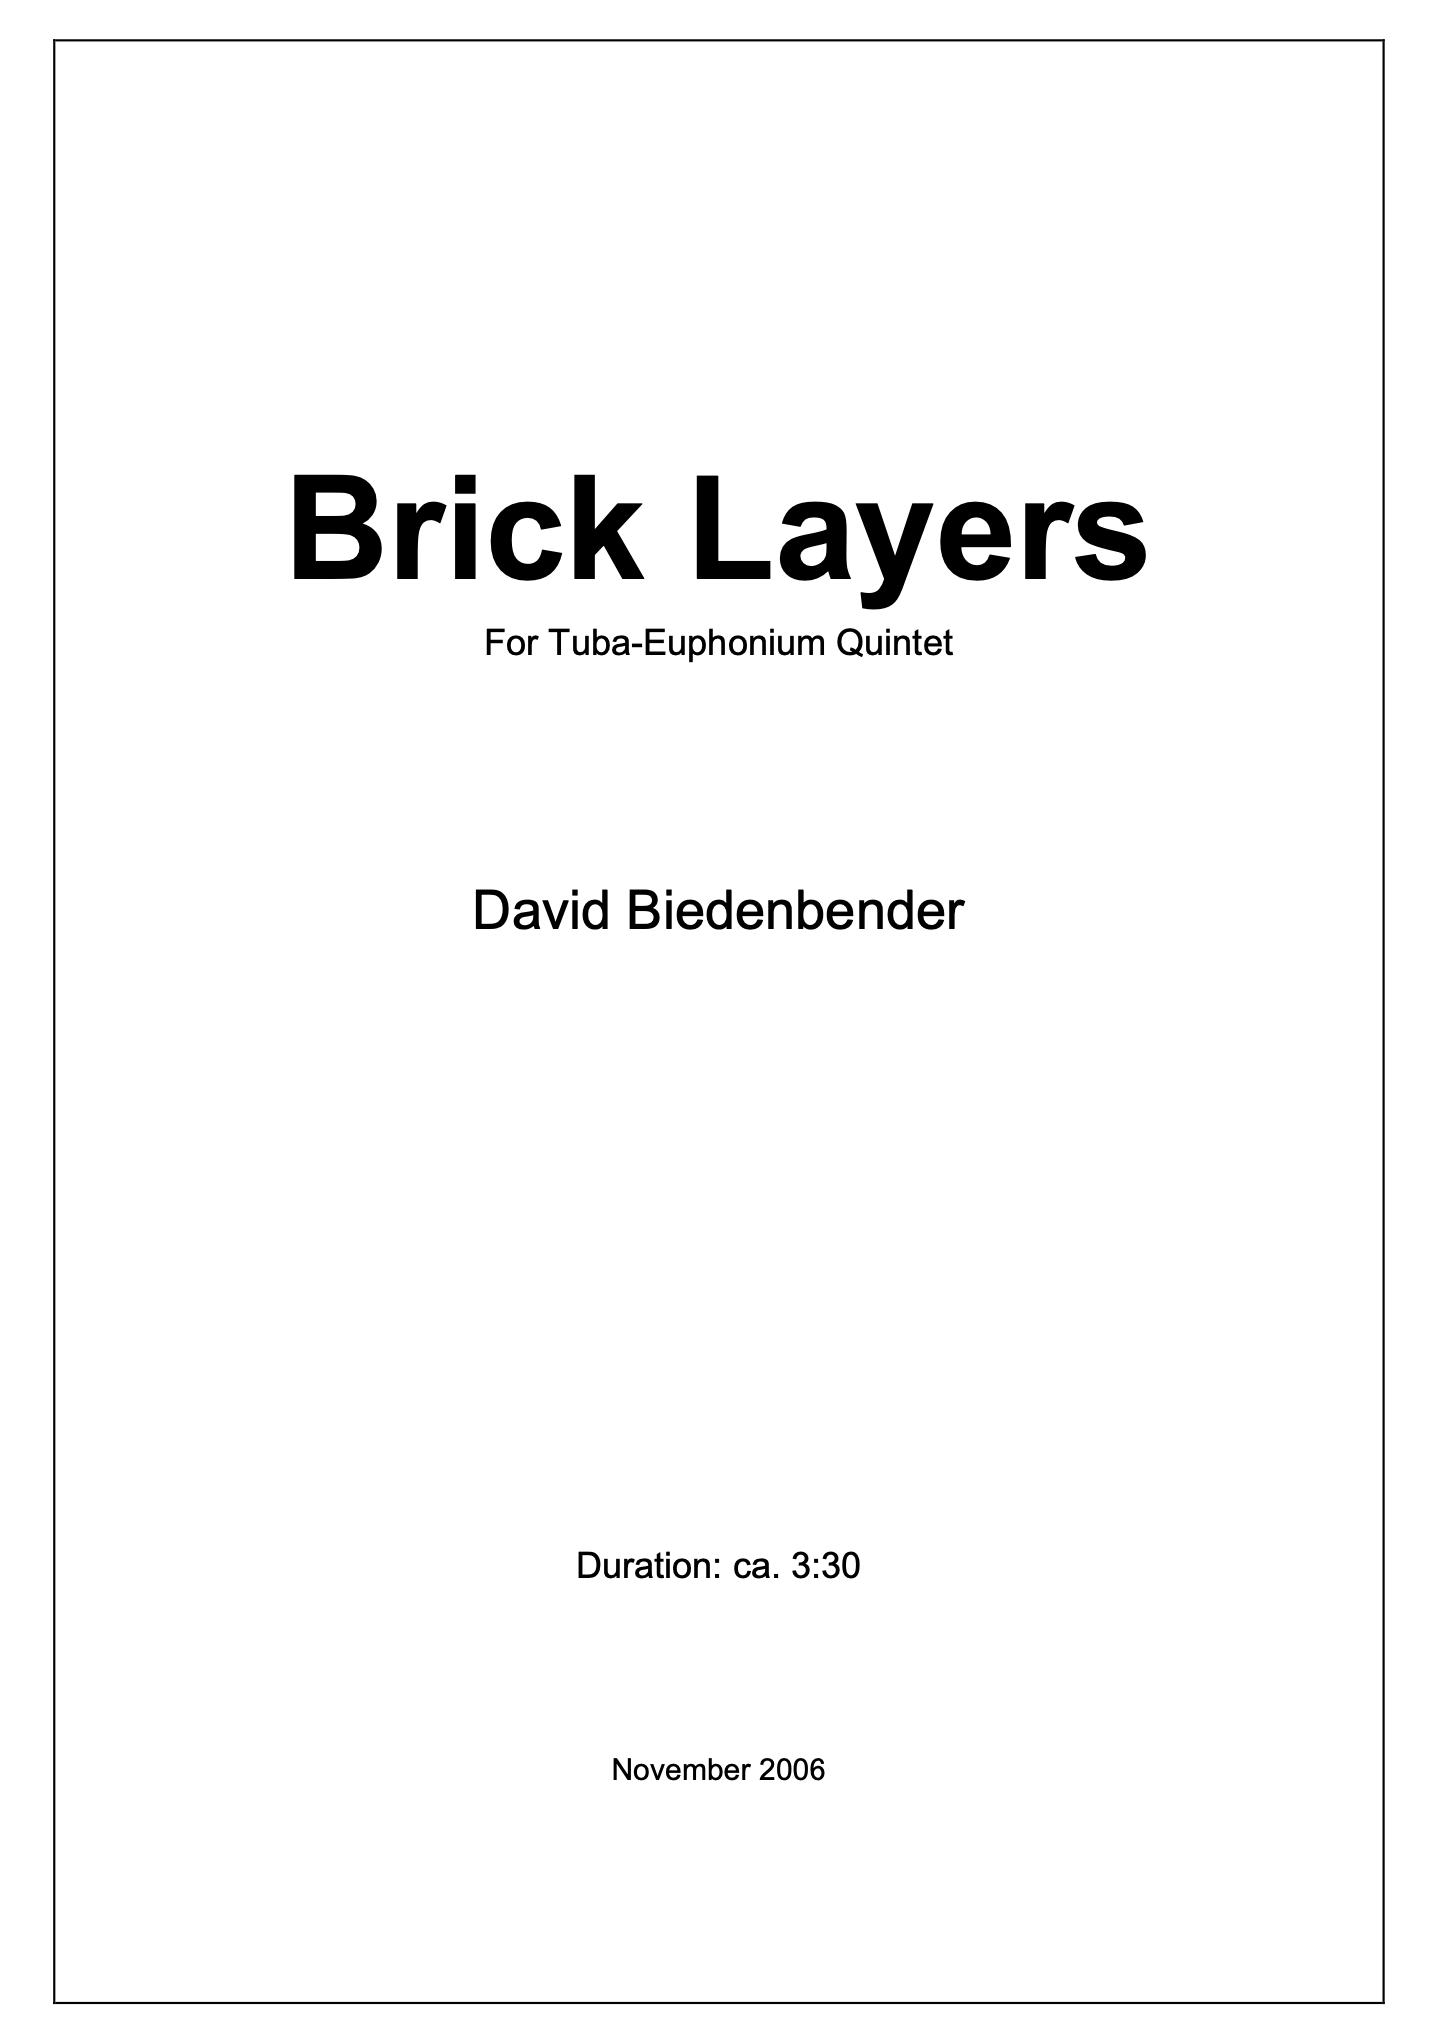 Brick Layers by David Biedenbender